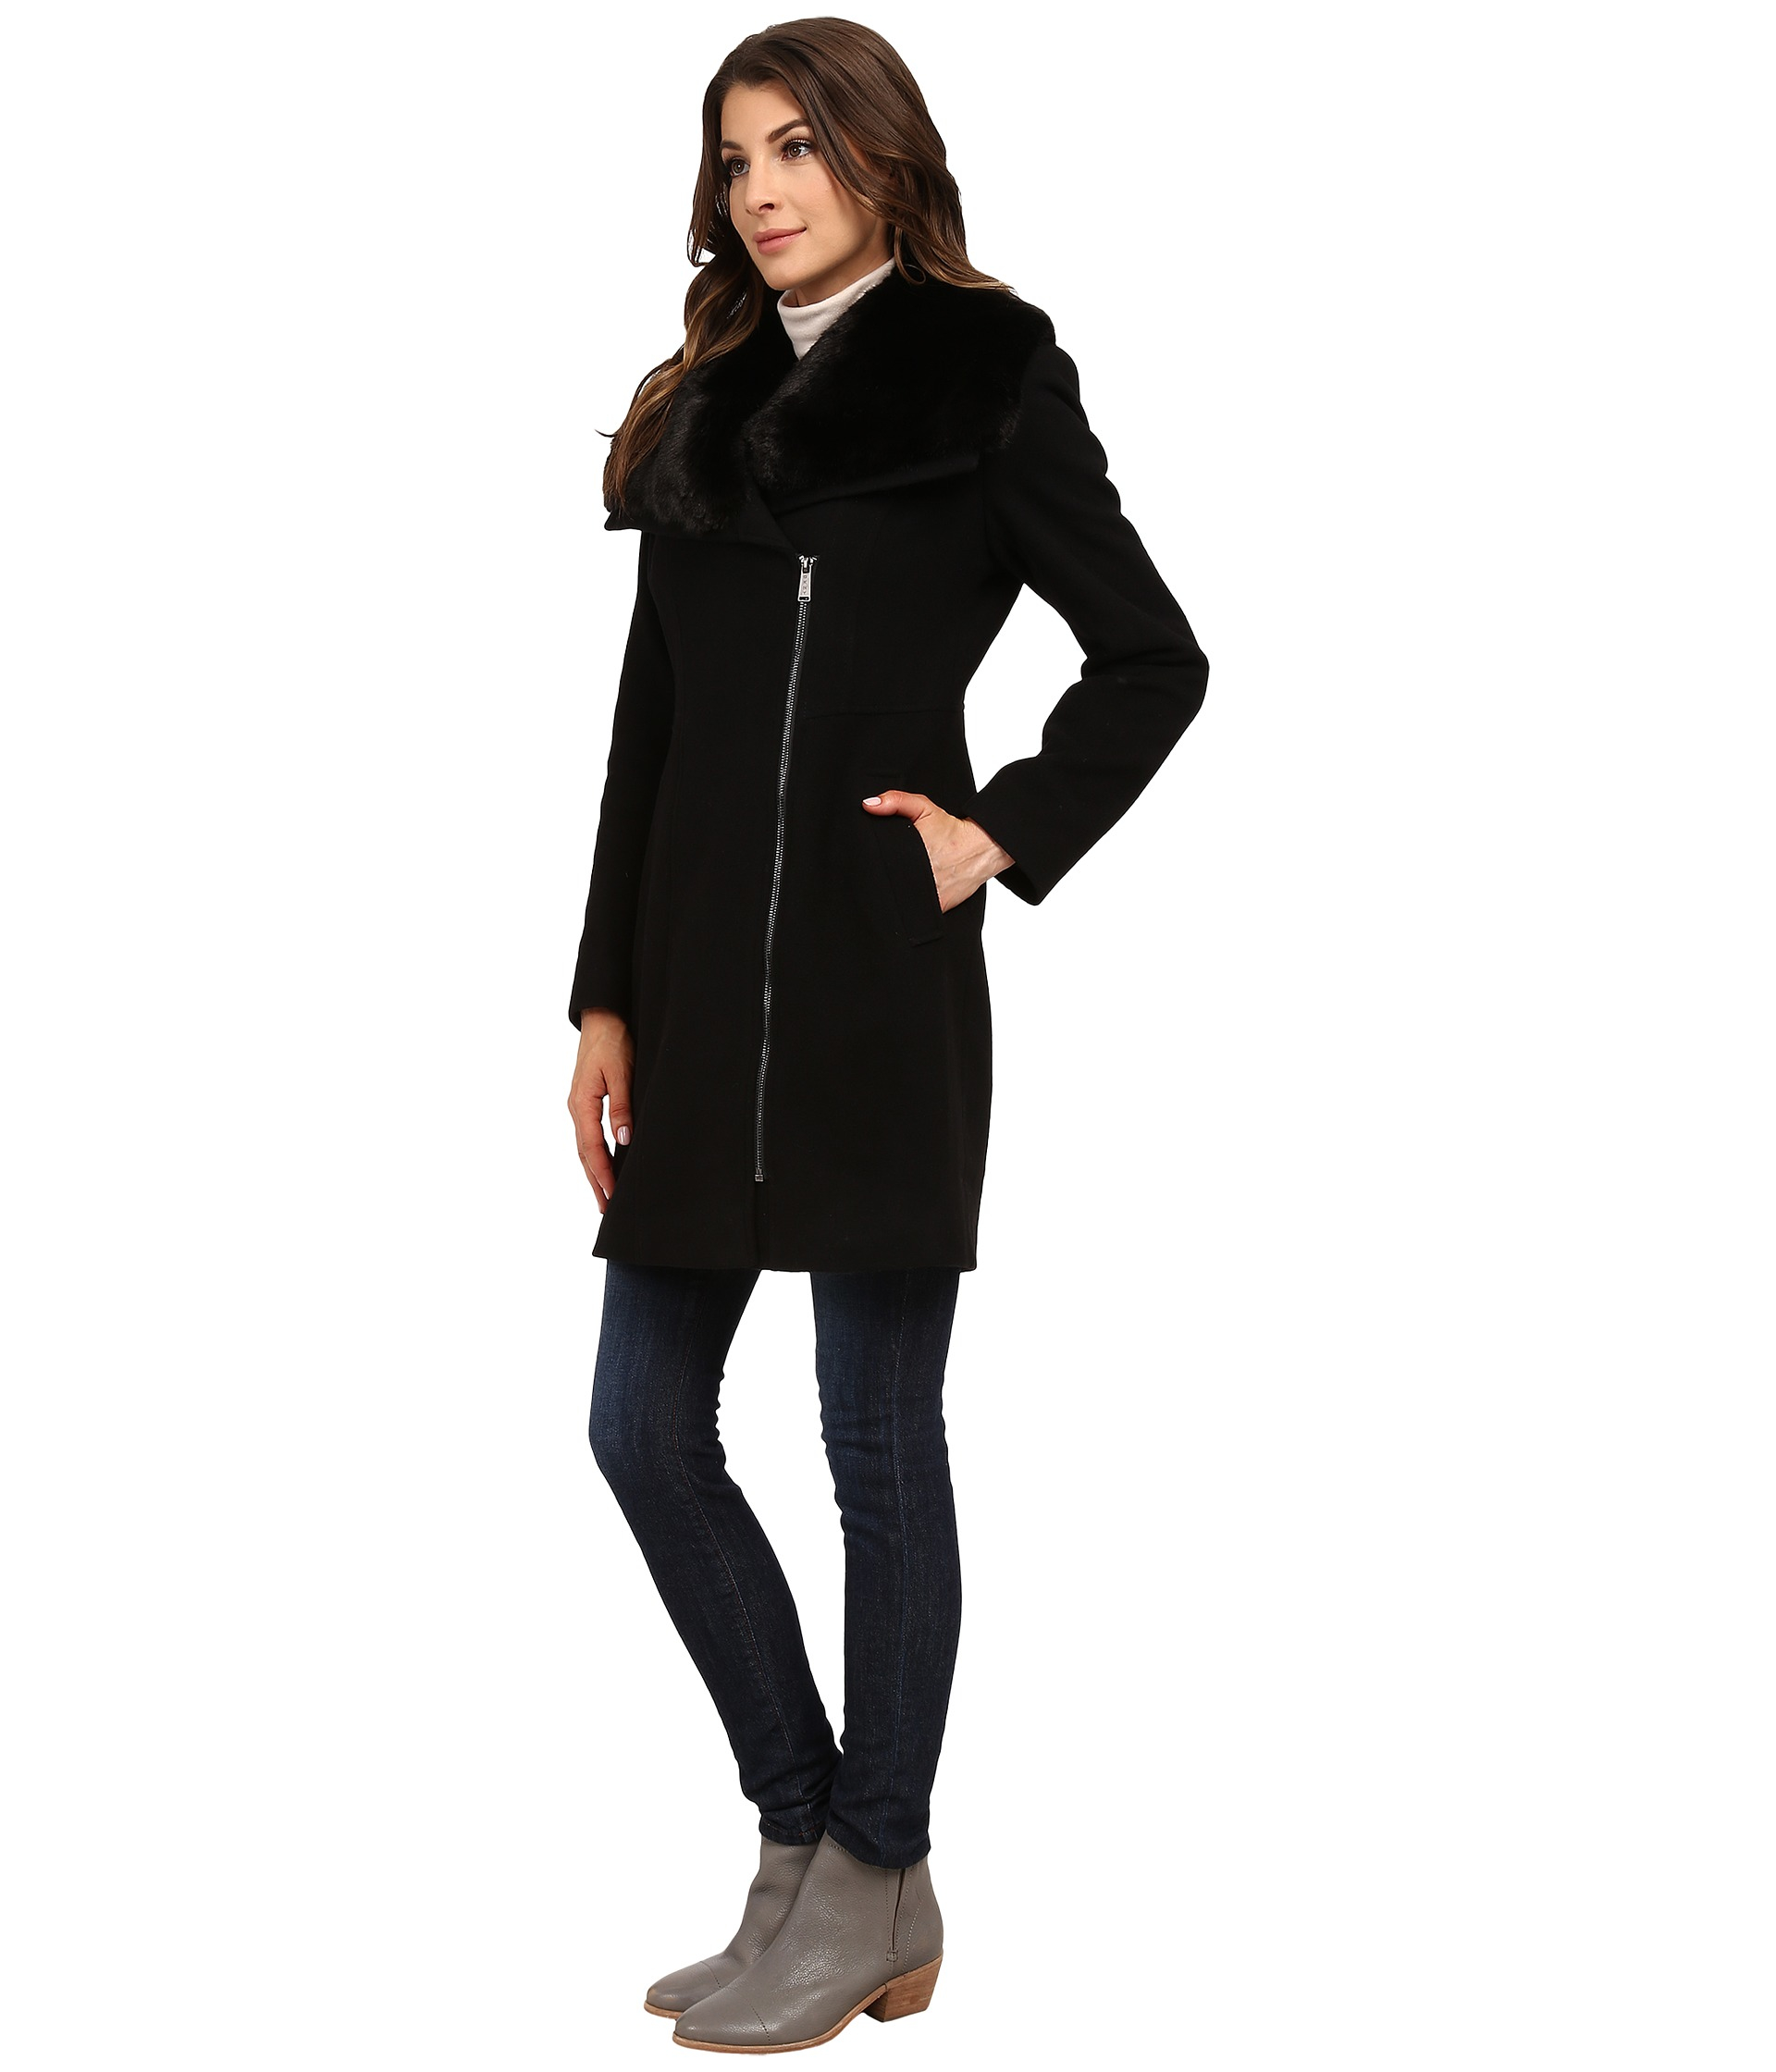 lyst dkny asymmetrical zip w faux fur collar 30967 y5 in black. Black Bedroom Furniture Sets. Home Design Ideas